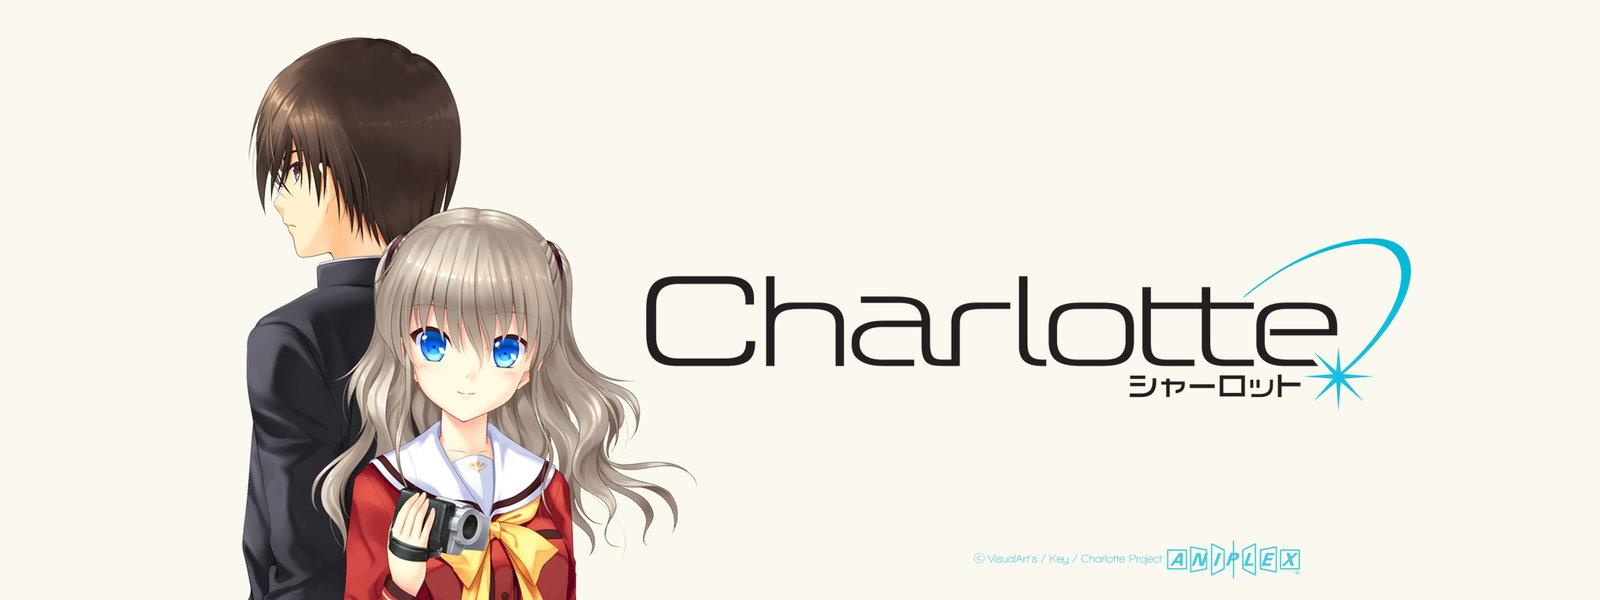 Watch Charlotte Online | Stream on Hulu